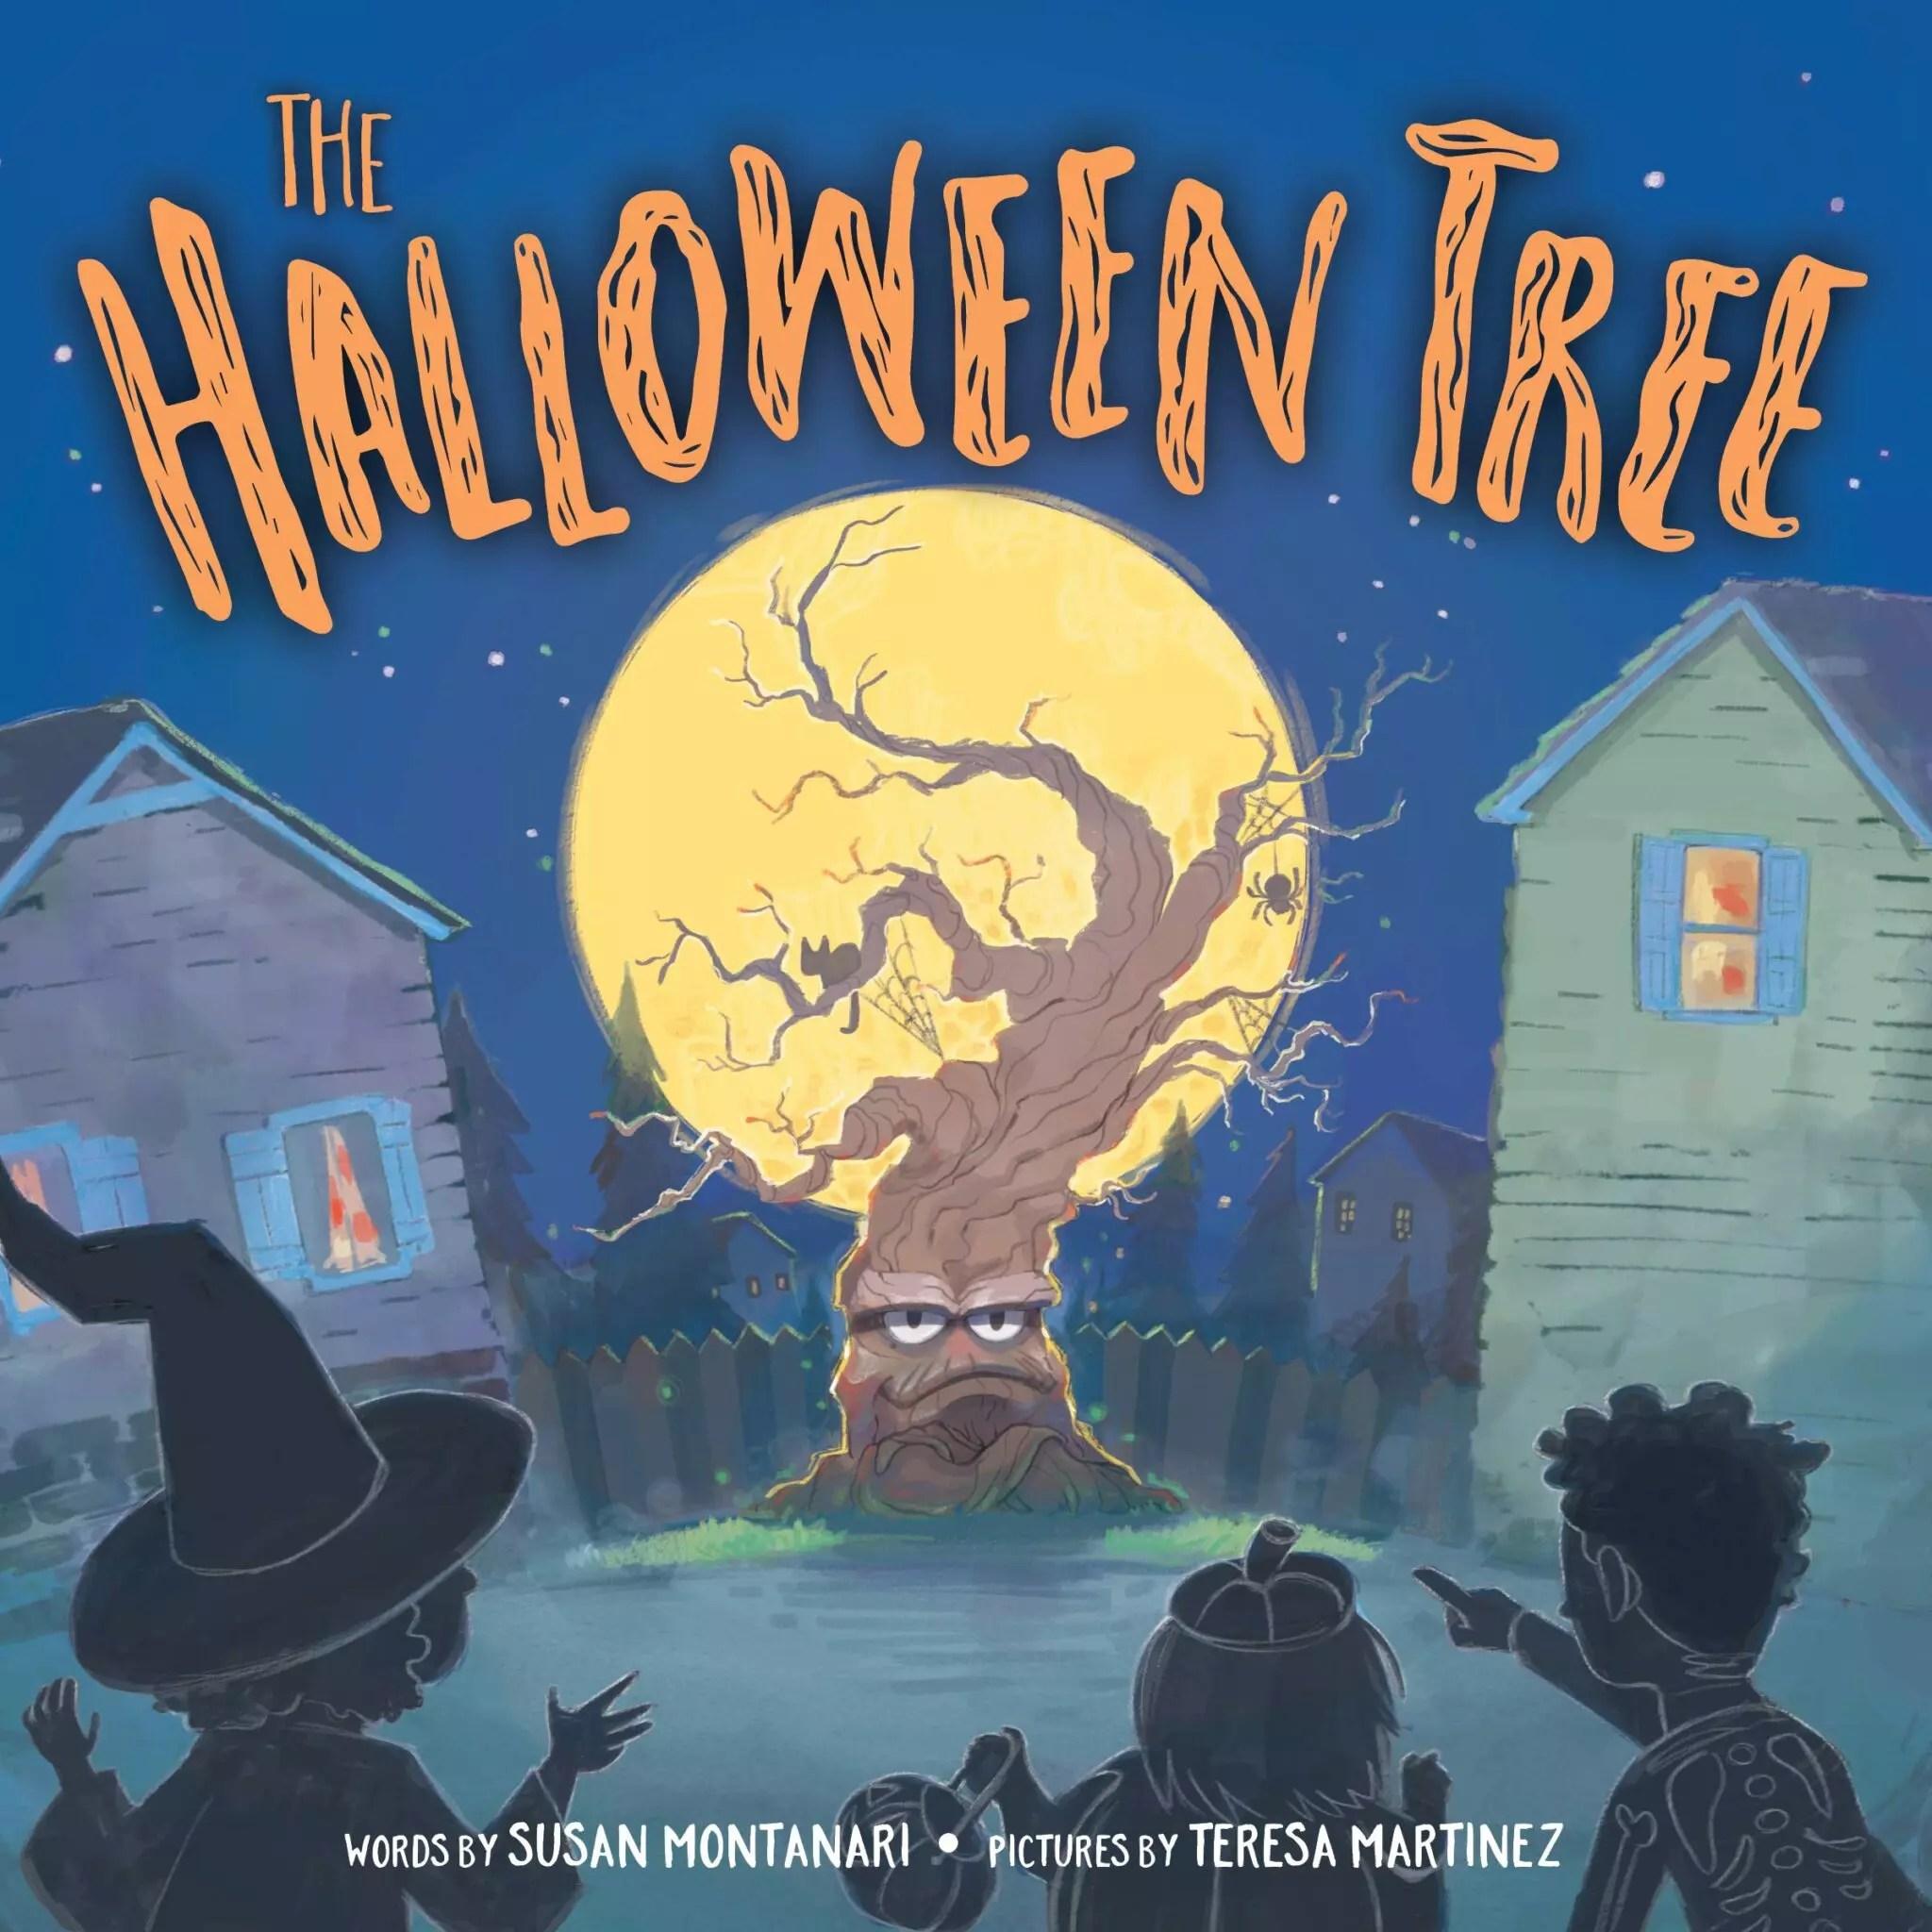 Susan Montanari The Halloween Tree cover